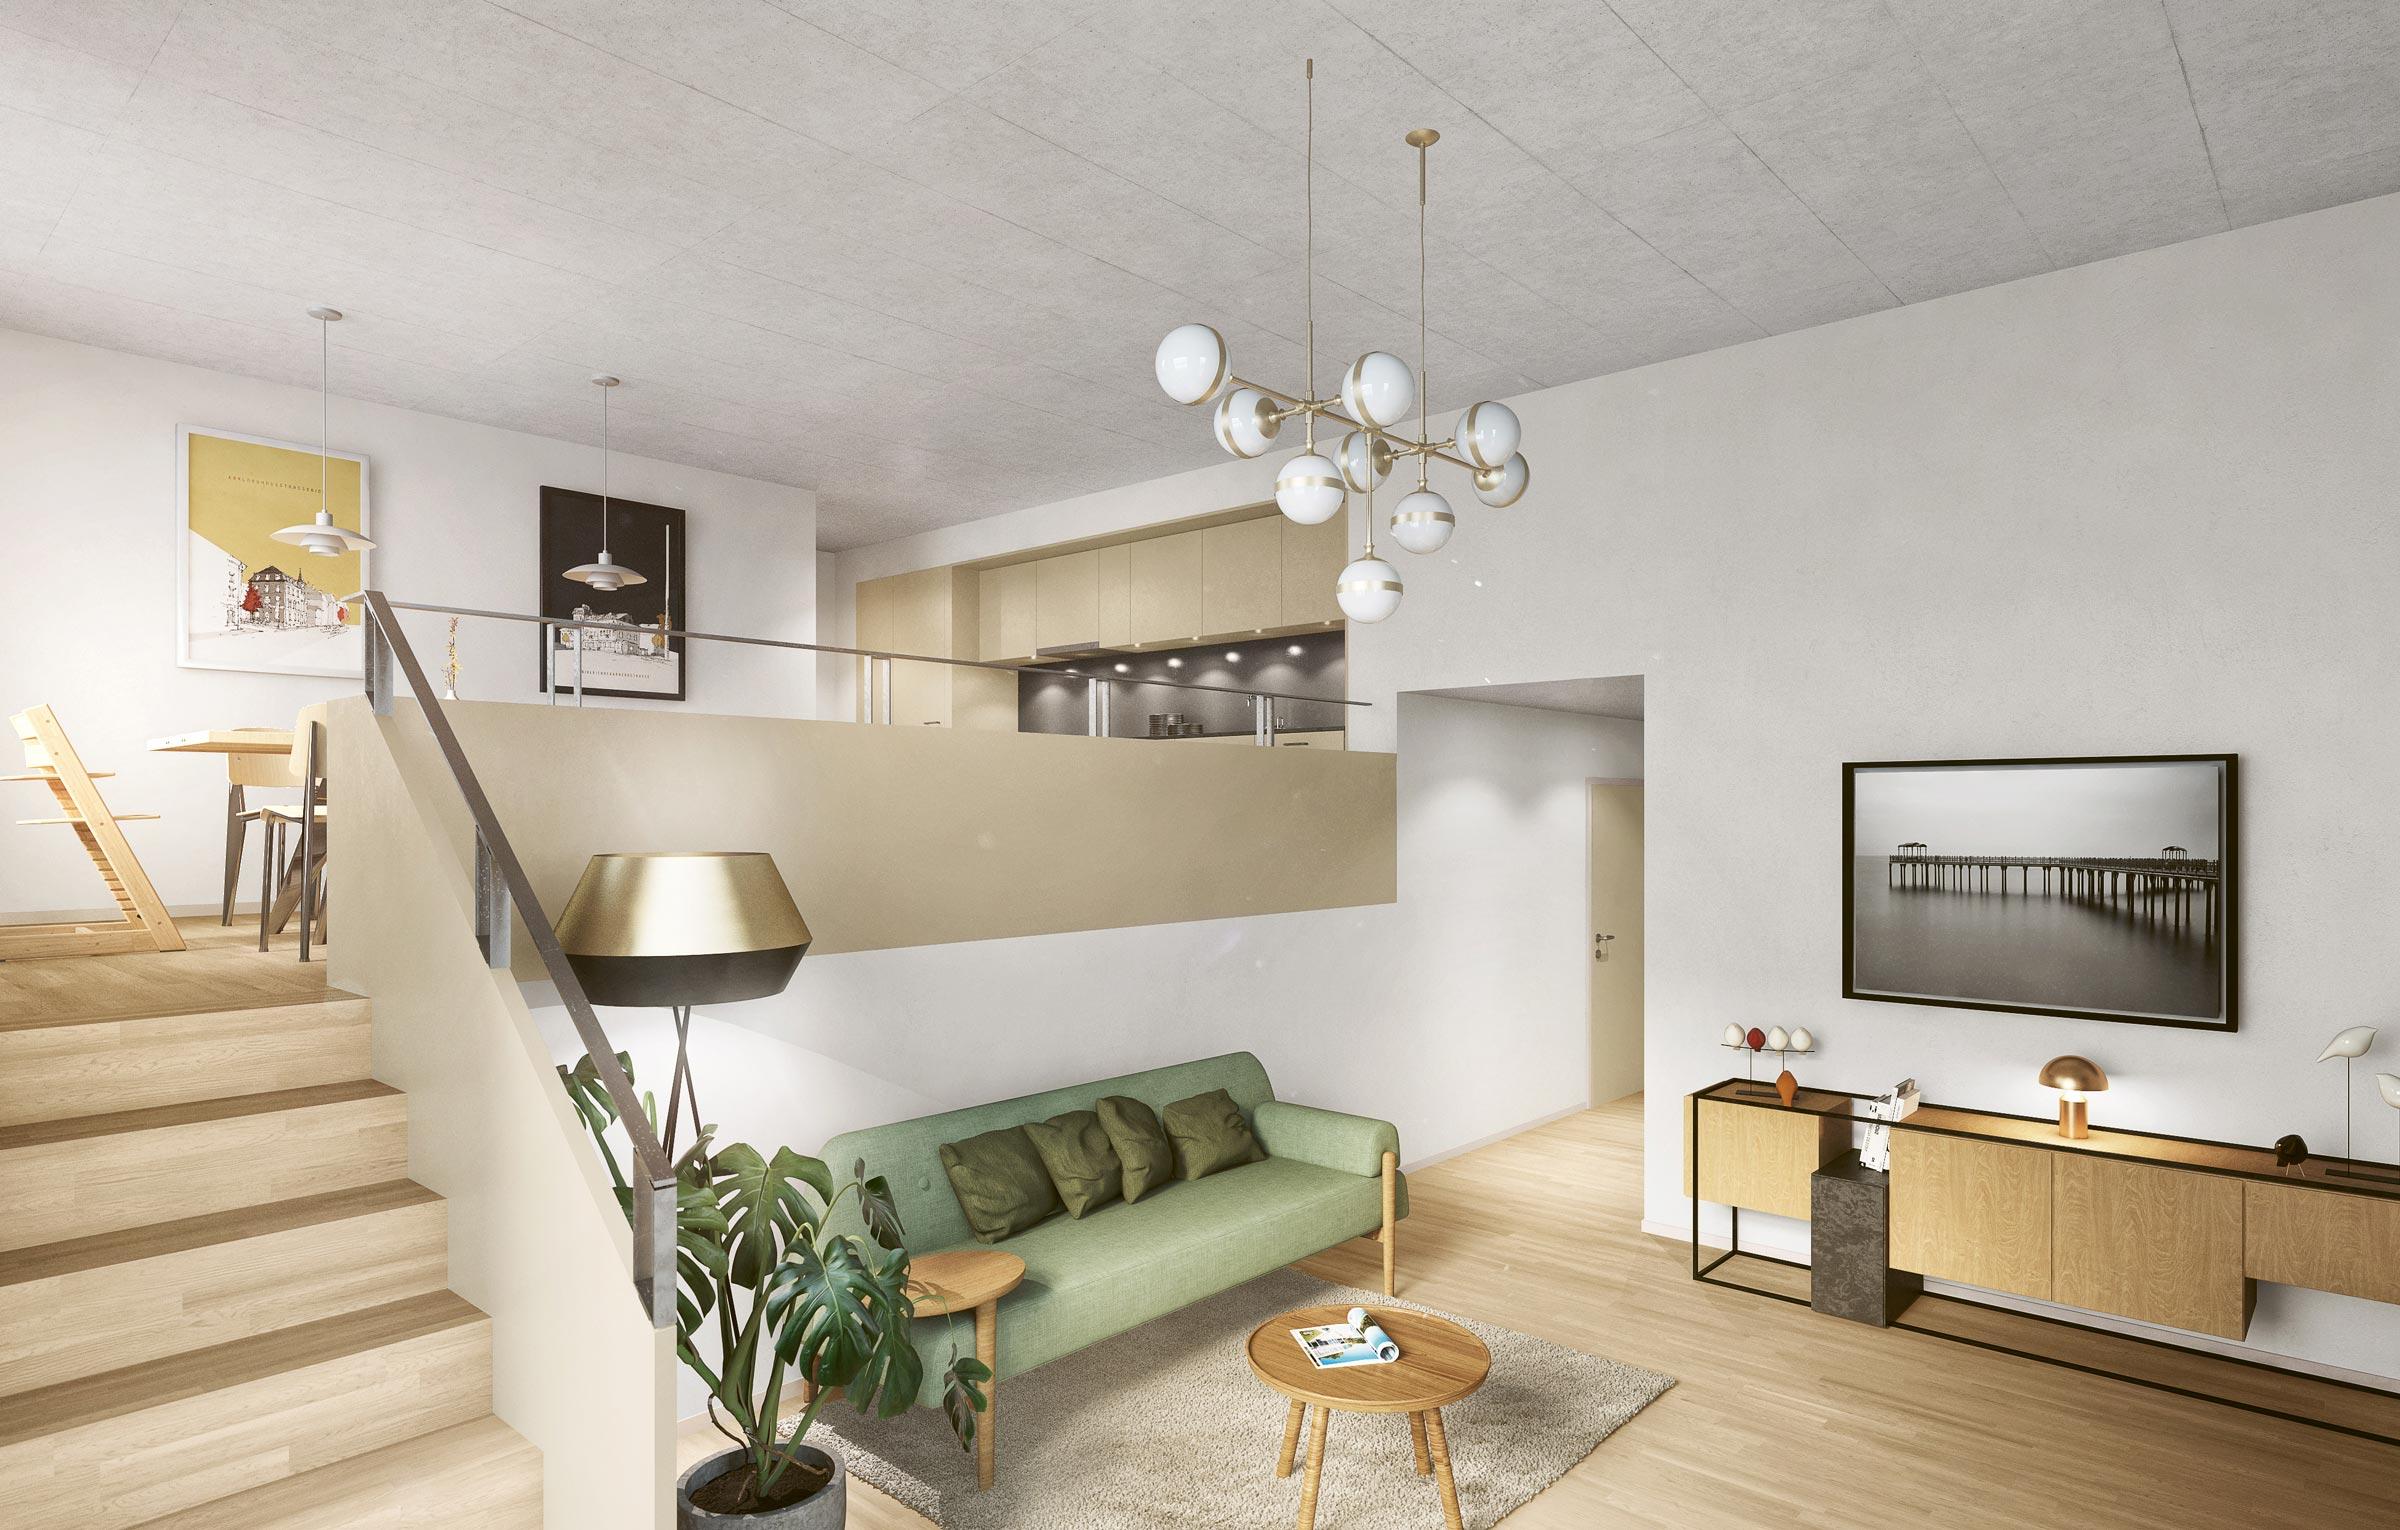 Split-Level-Raumgefühl Wohnung 302 Schwerzestrasse 8, Oetwil am See